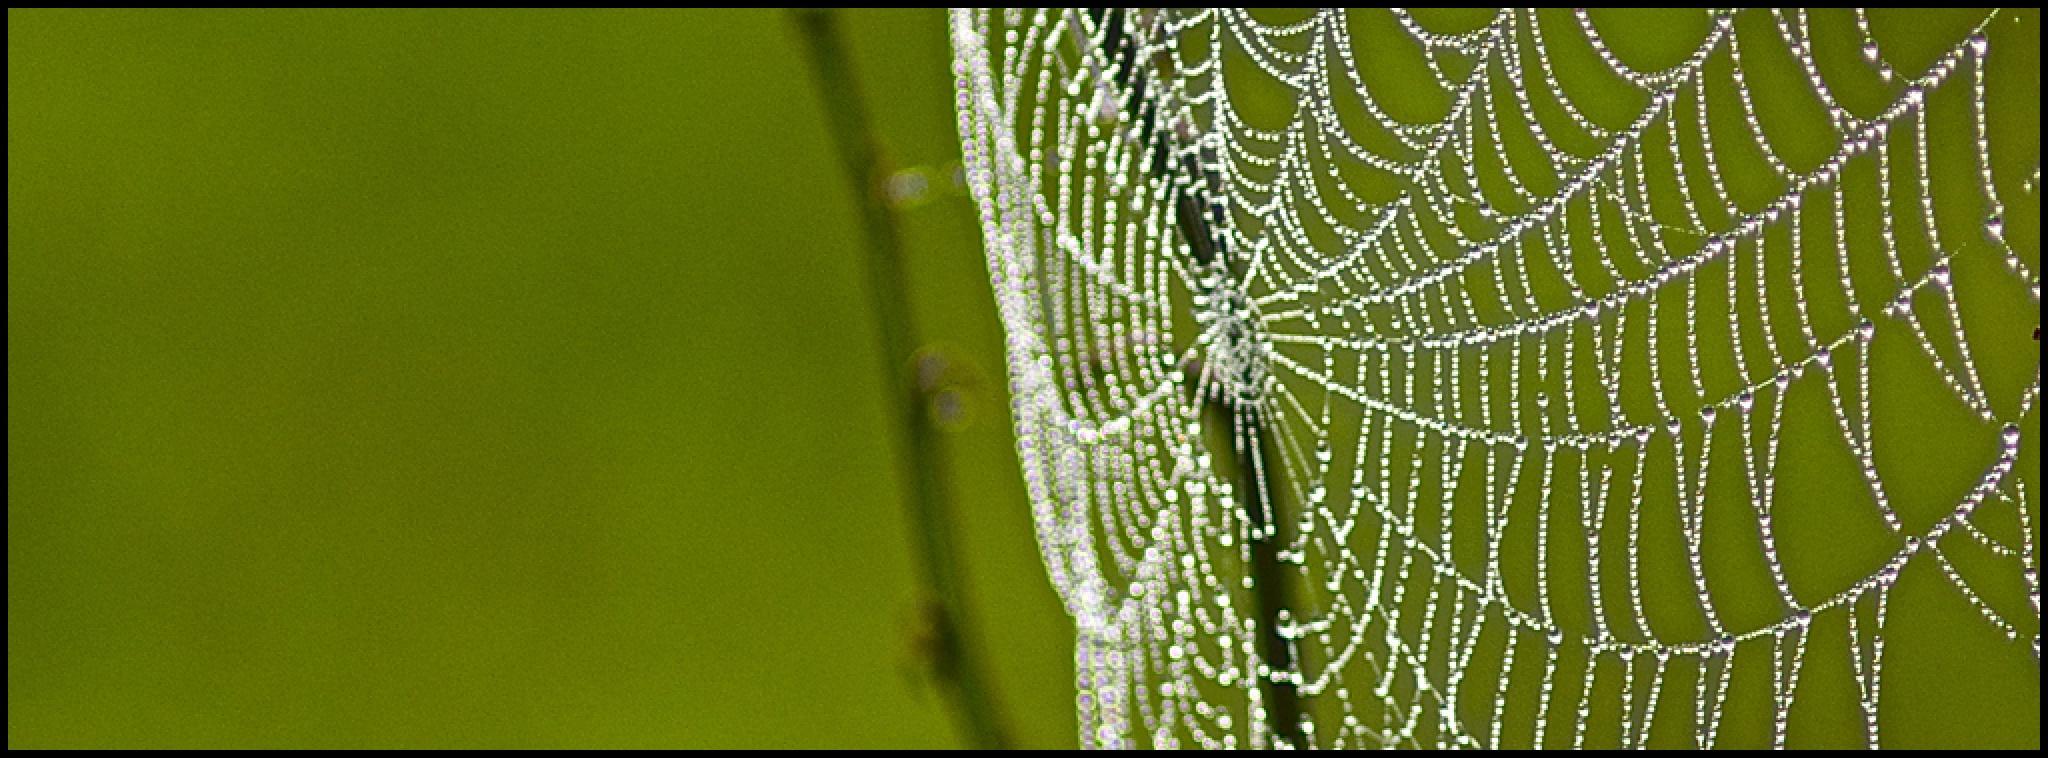 Wet Web by Fay R. Dildine, Jr.